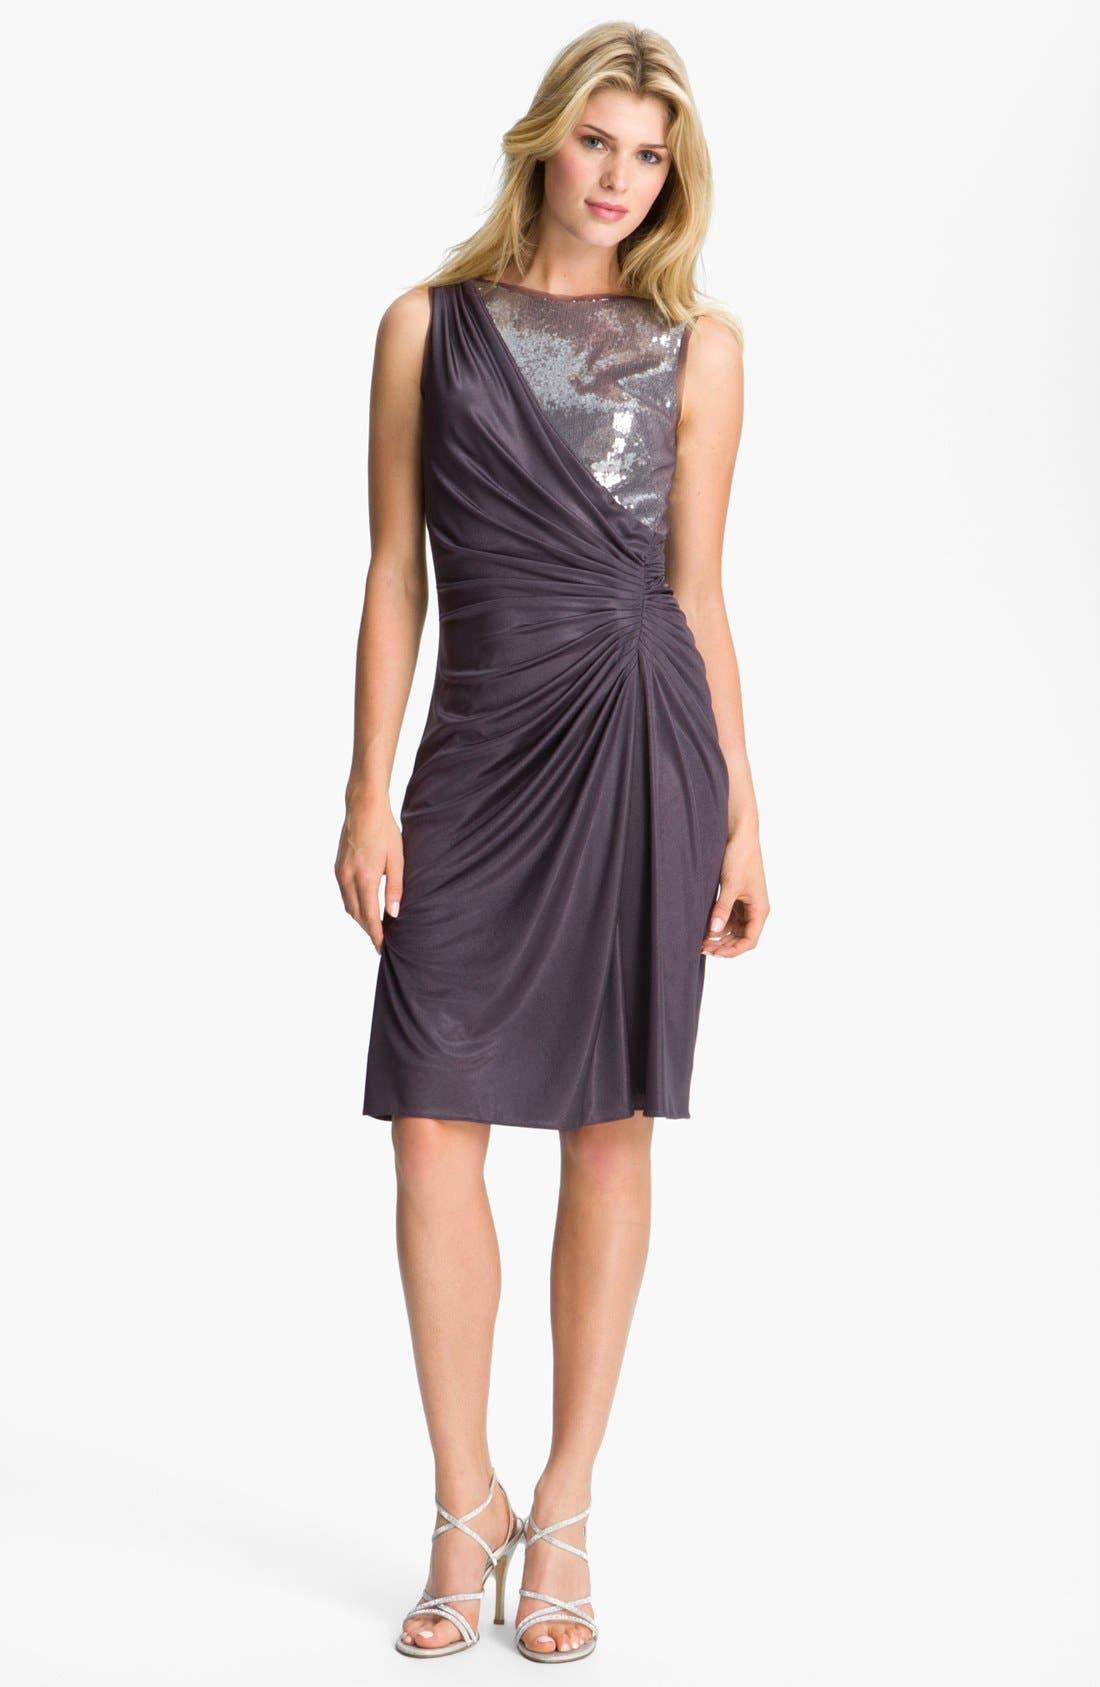 Alternate Image 1 Selected - Adrianna Papell Sequin Jersey Drape Dress (Petite)